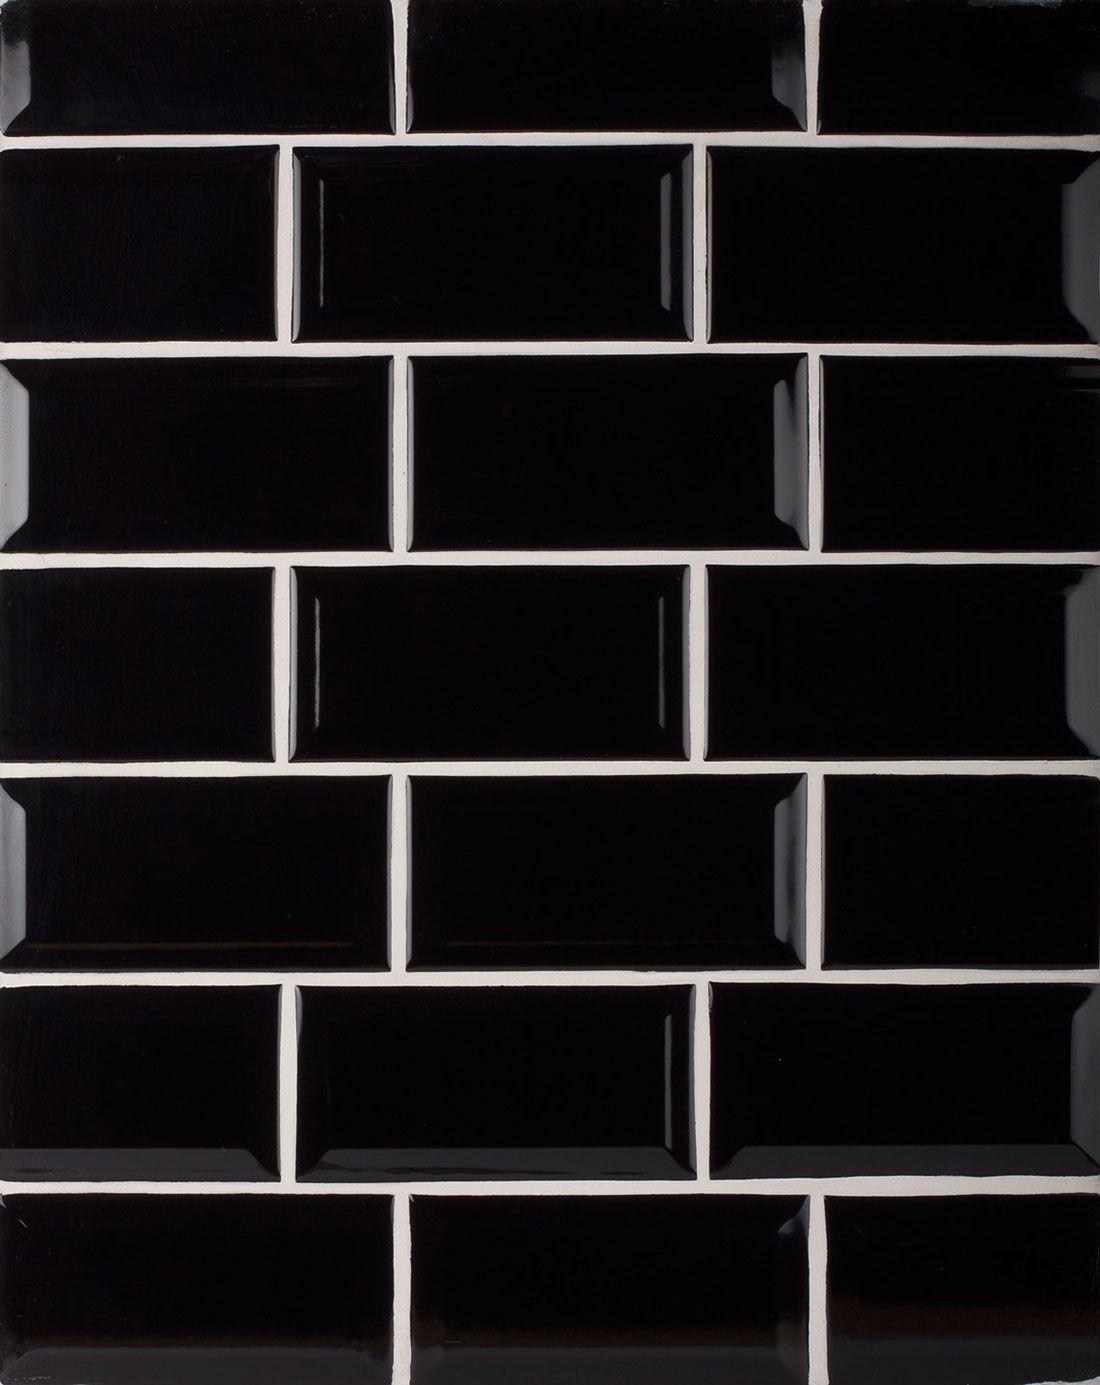 Biselado Negro Kitchen Wall Tile Creates A Great